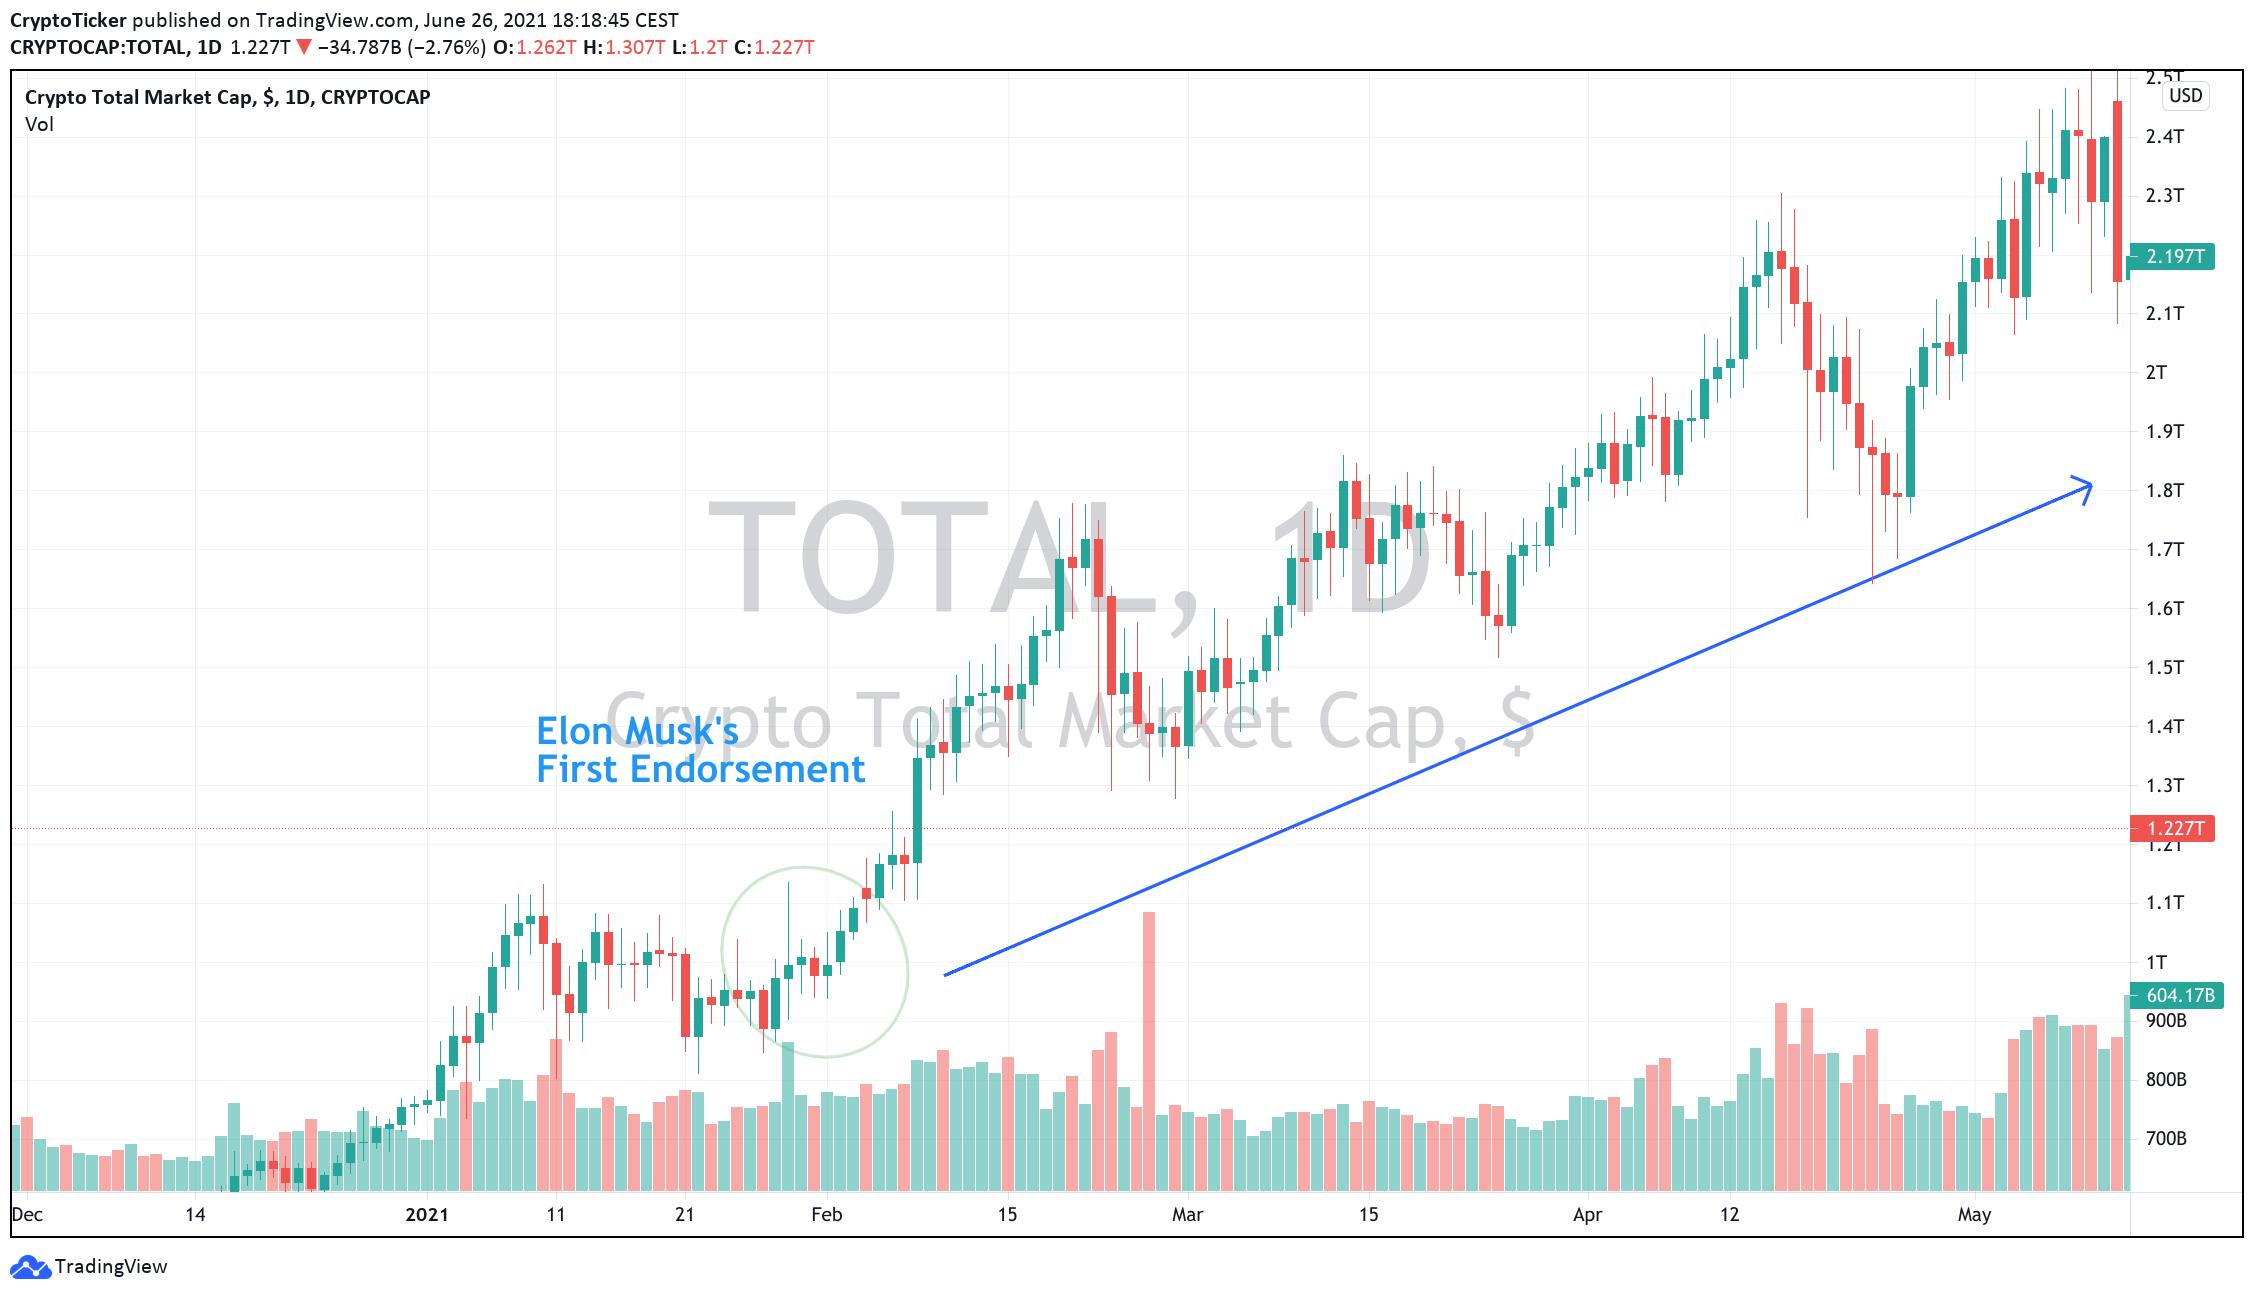 Elon Musk Crypto - Total market cap in USD